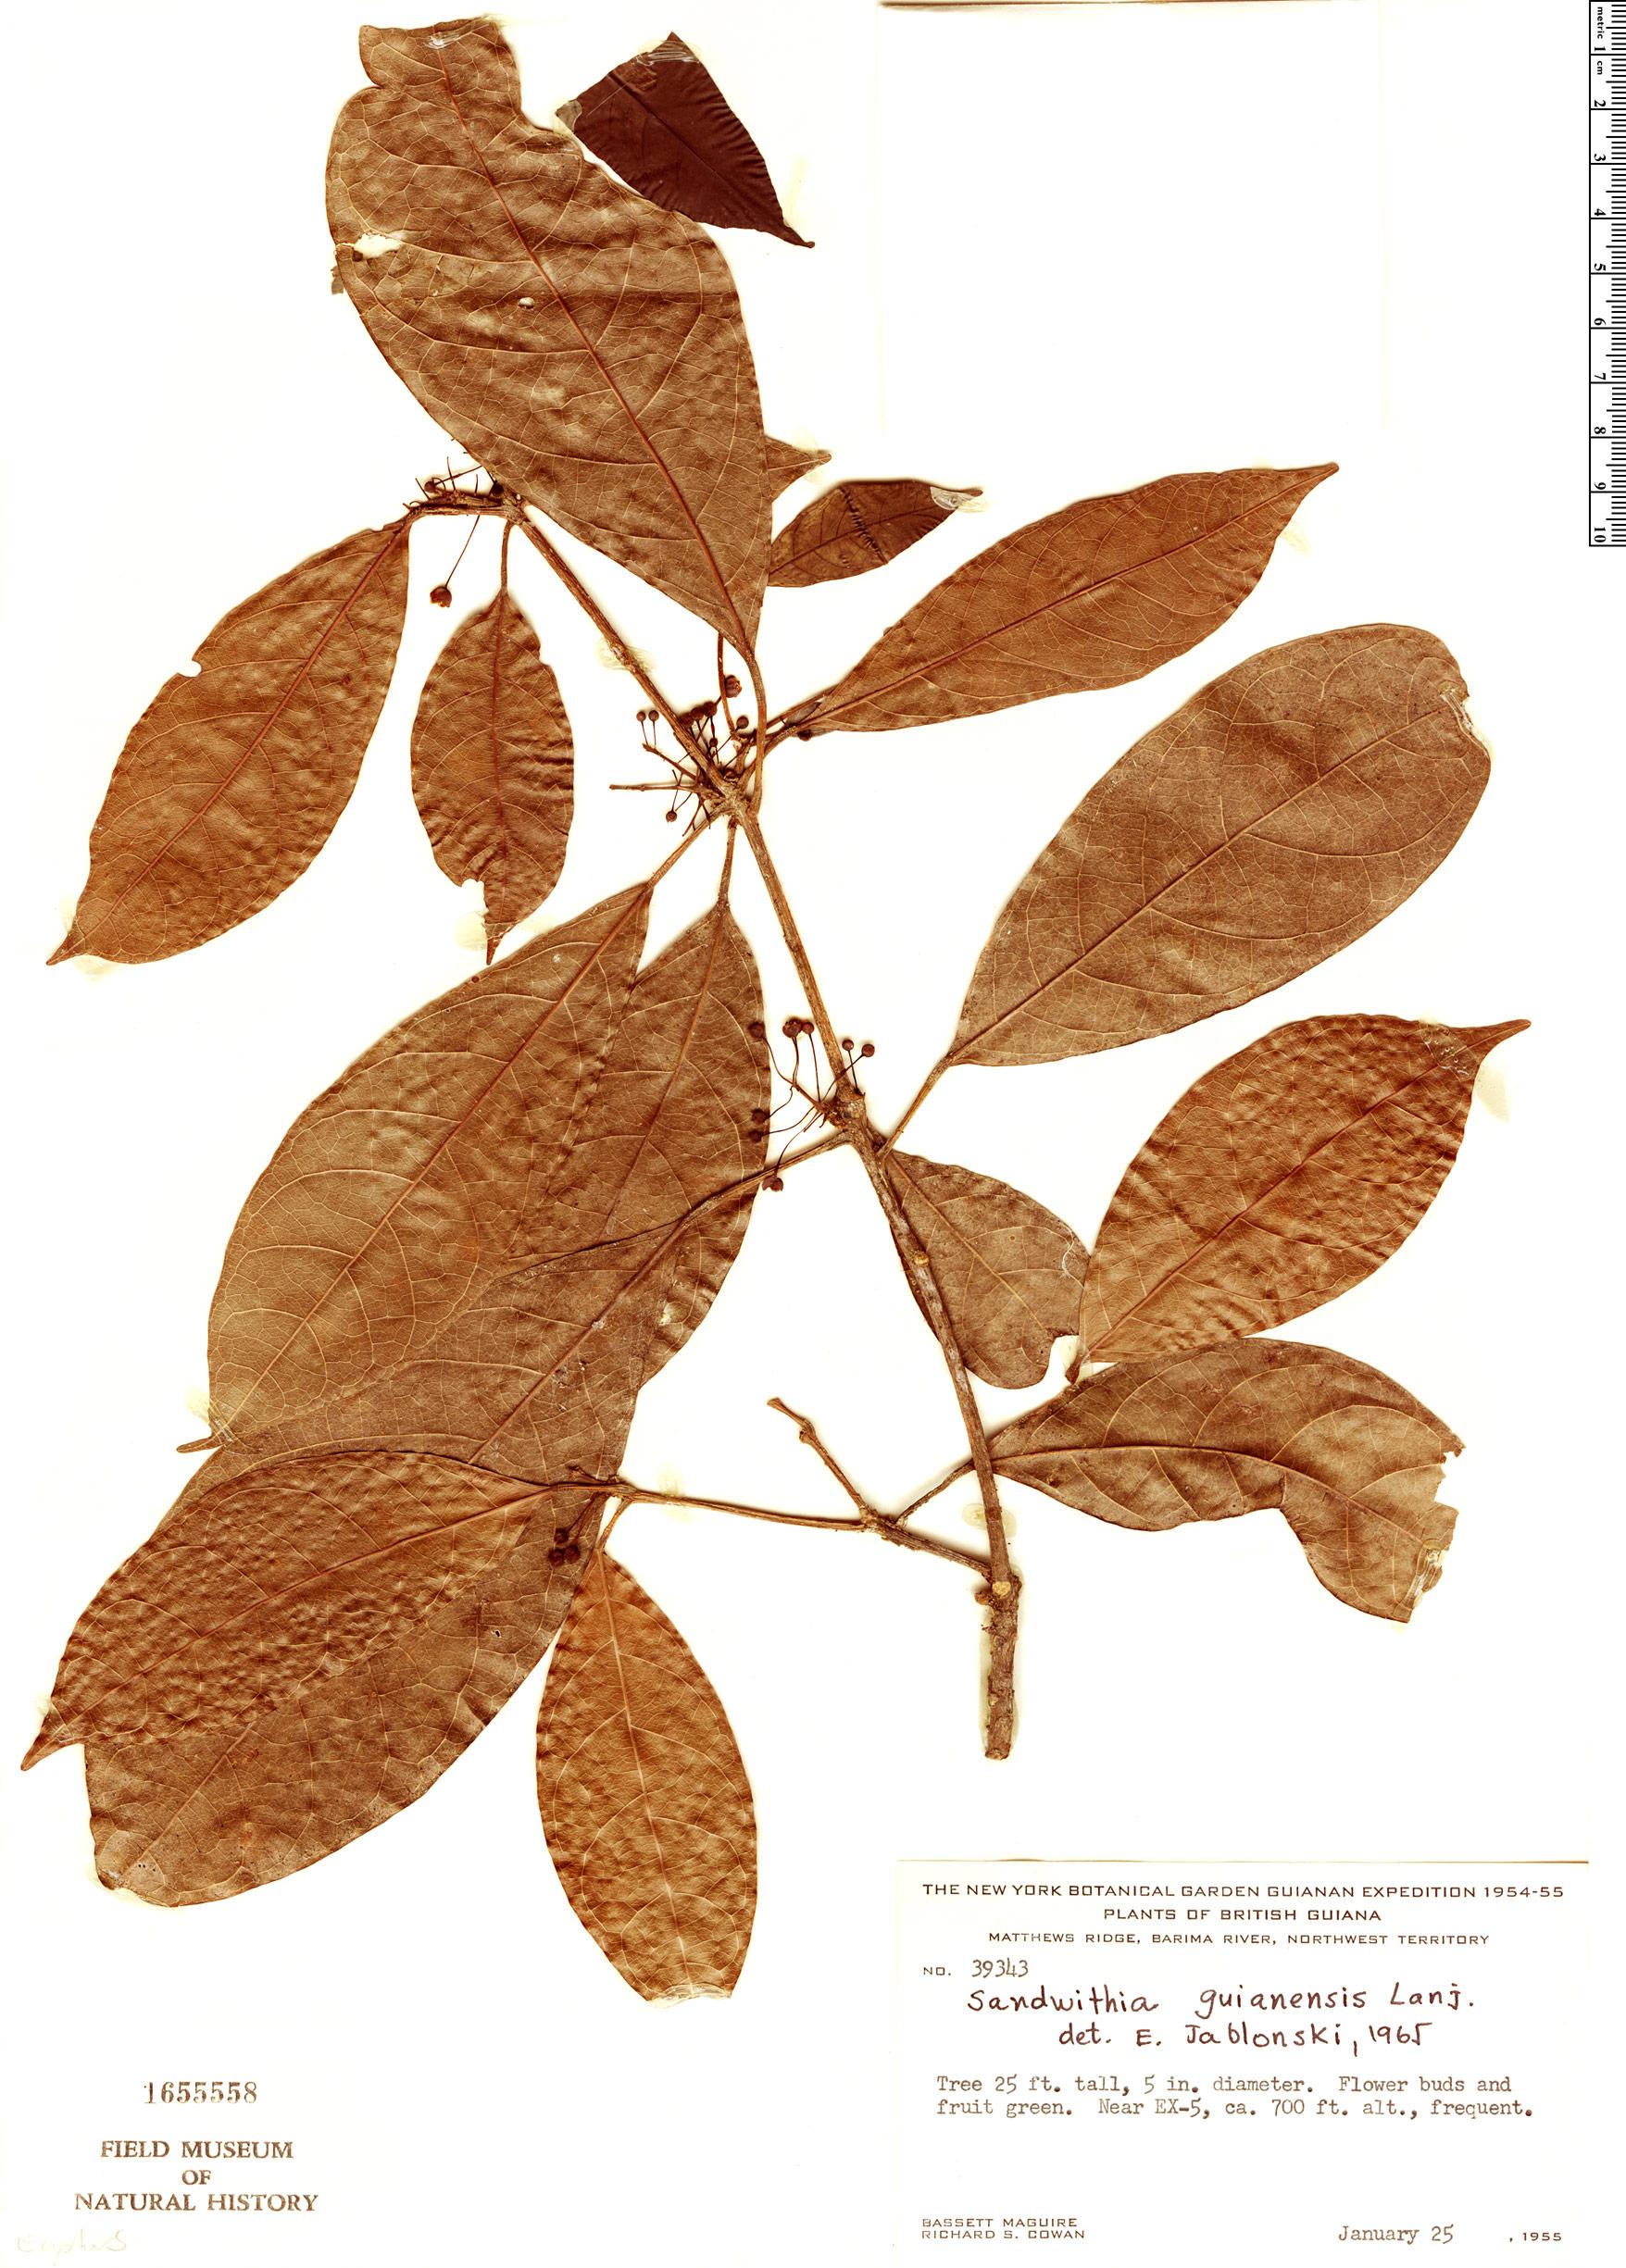 Specimen: Sandwithia guyanensis